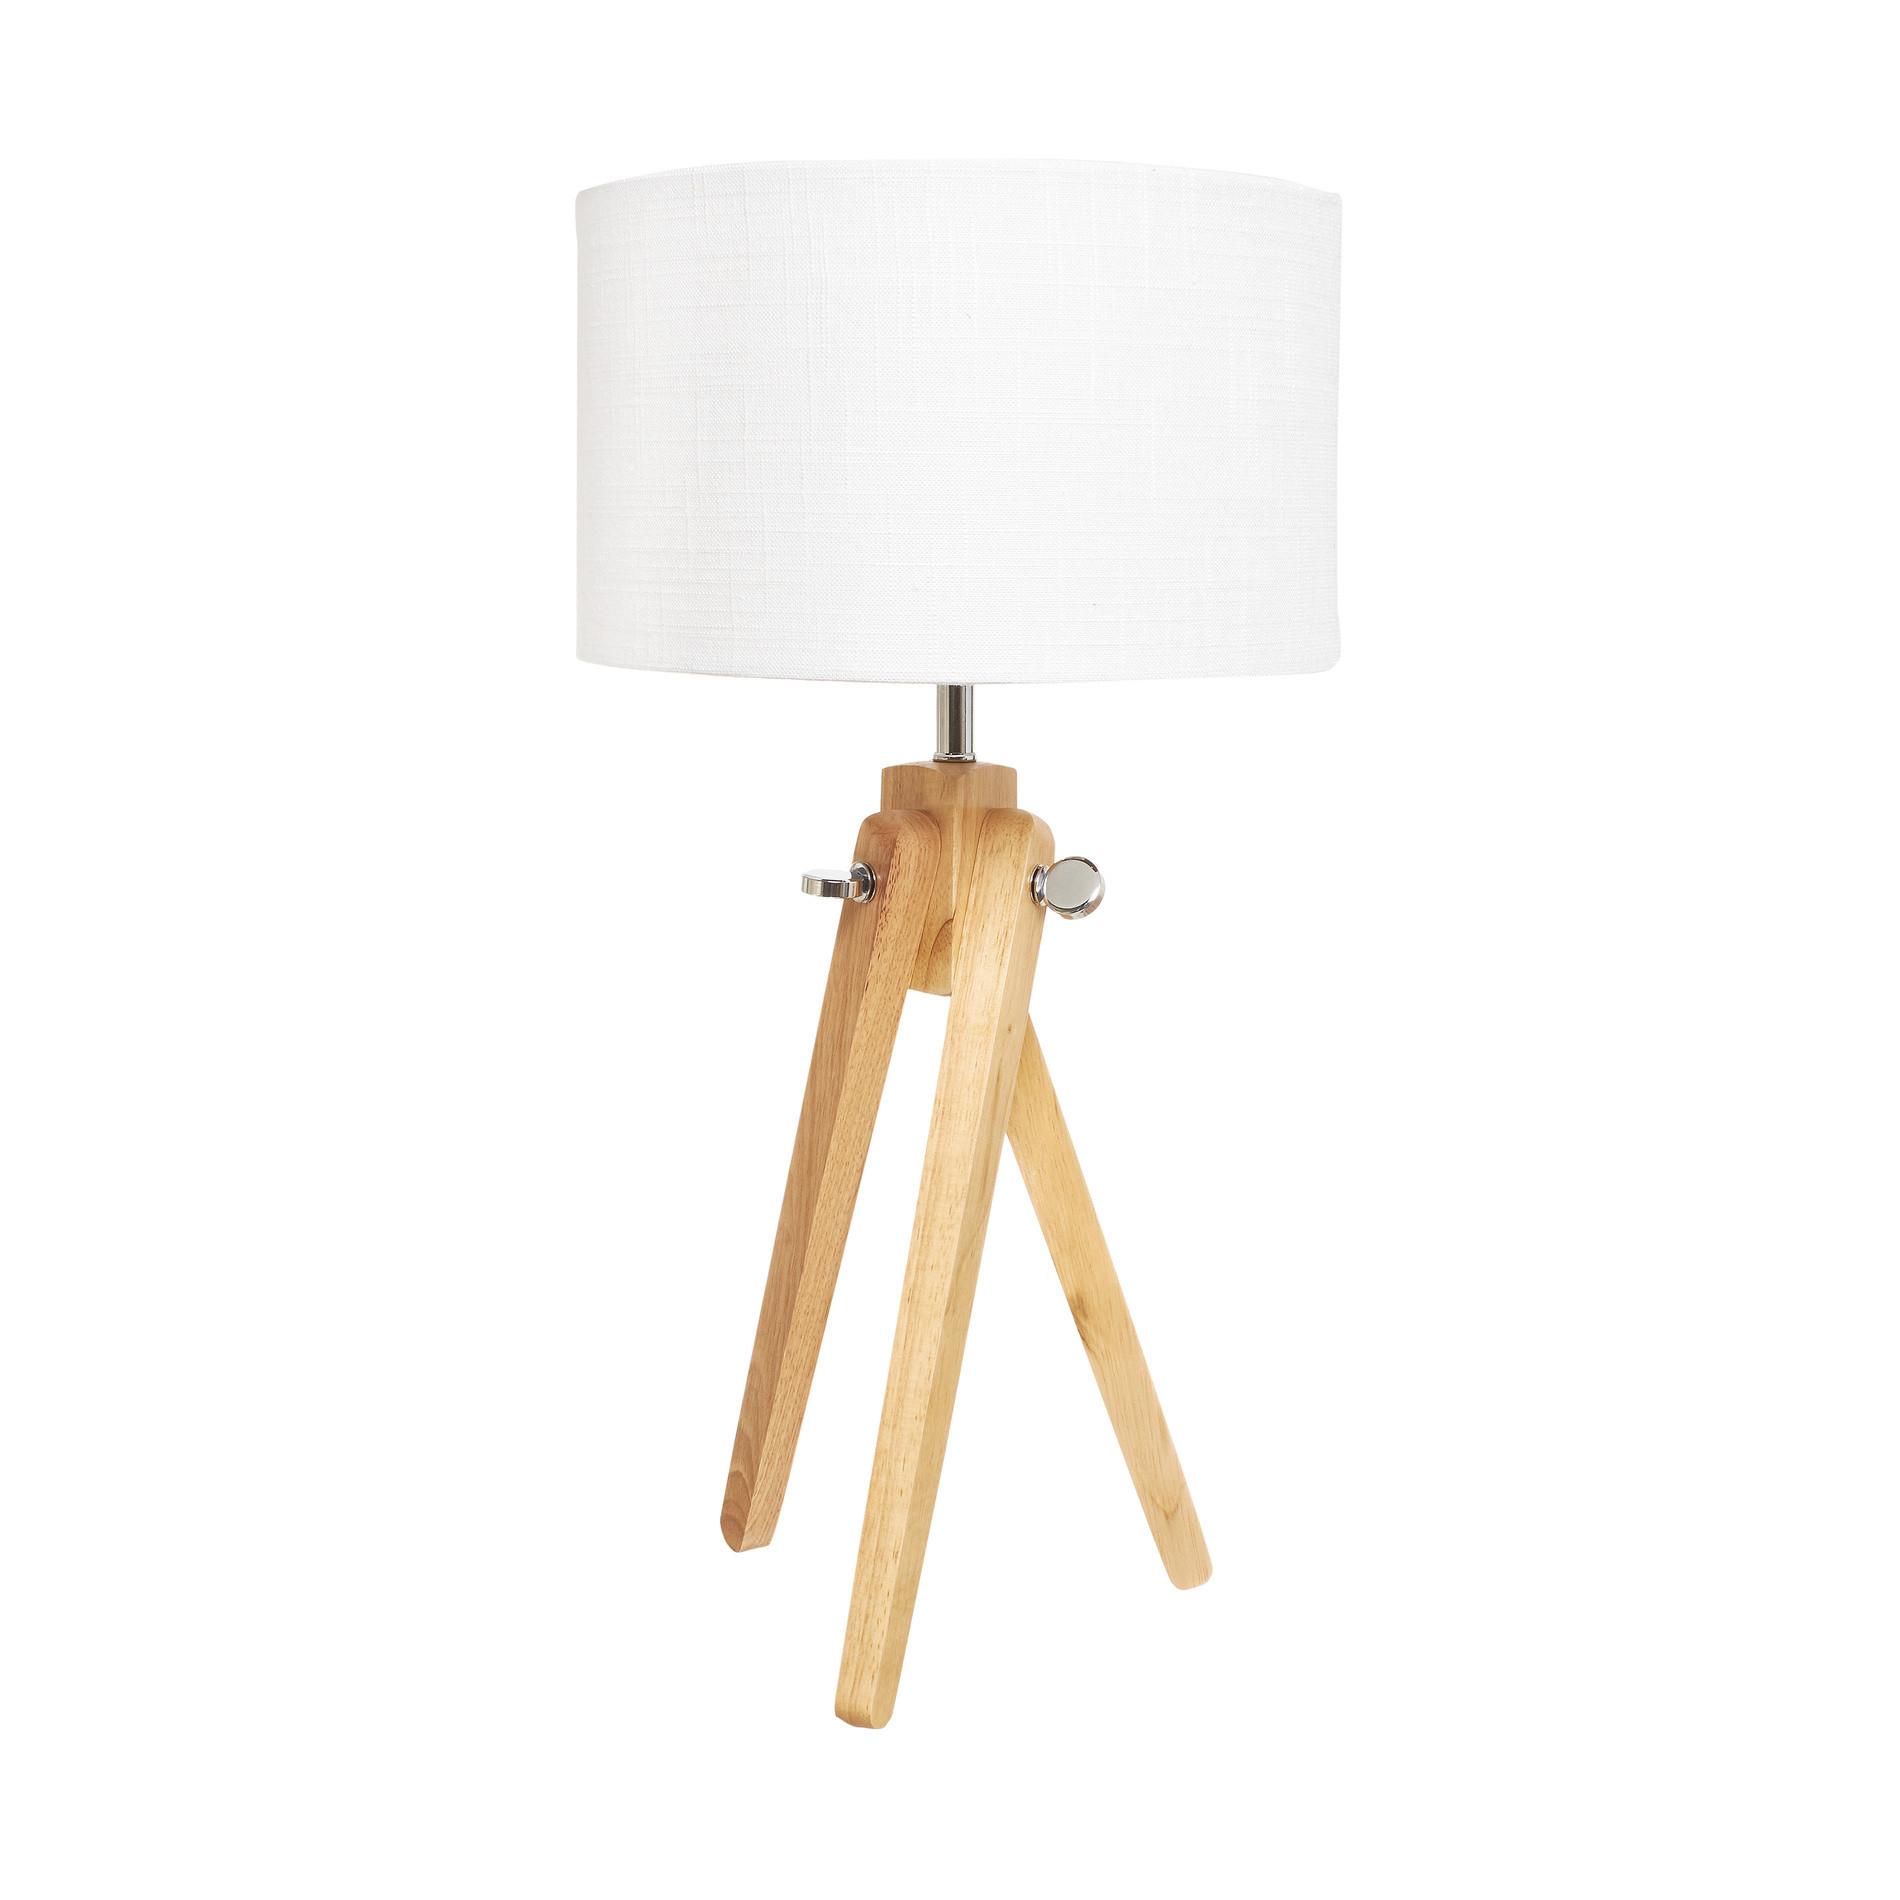 Spider Lampada da Tavolo, Bianco/Oro, large image number 0